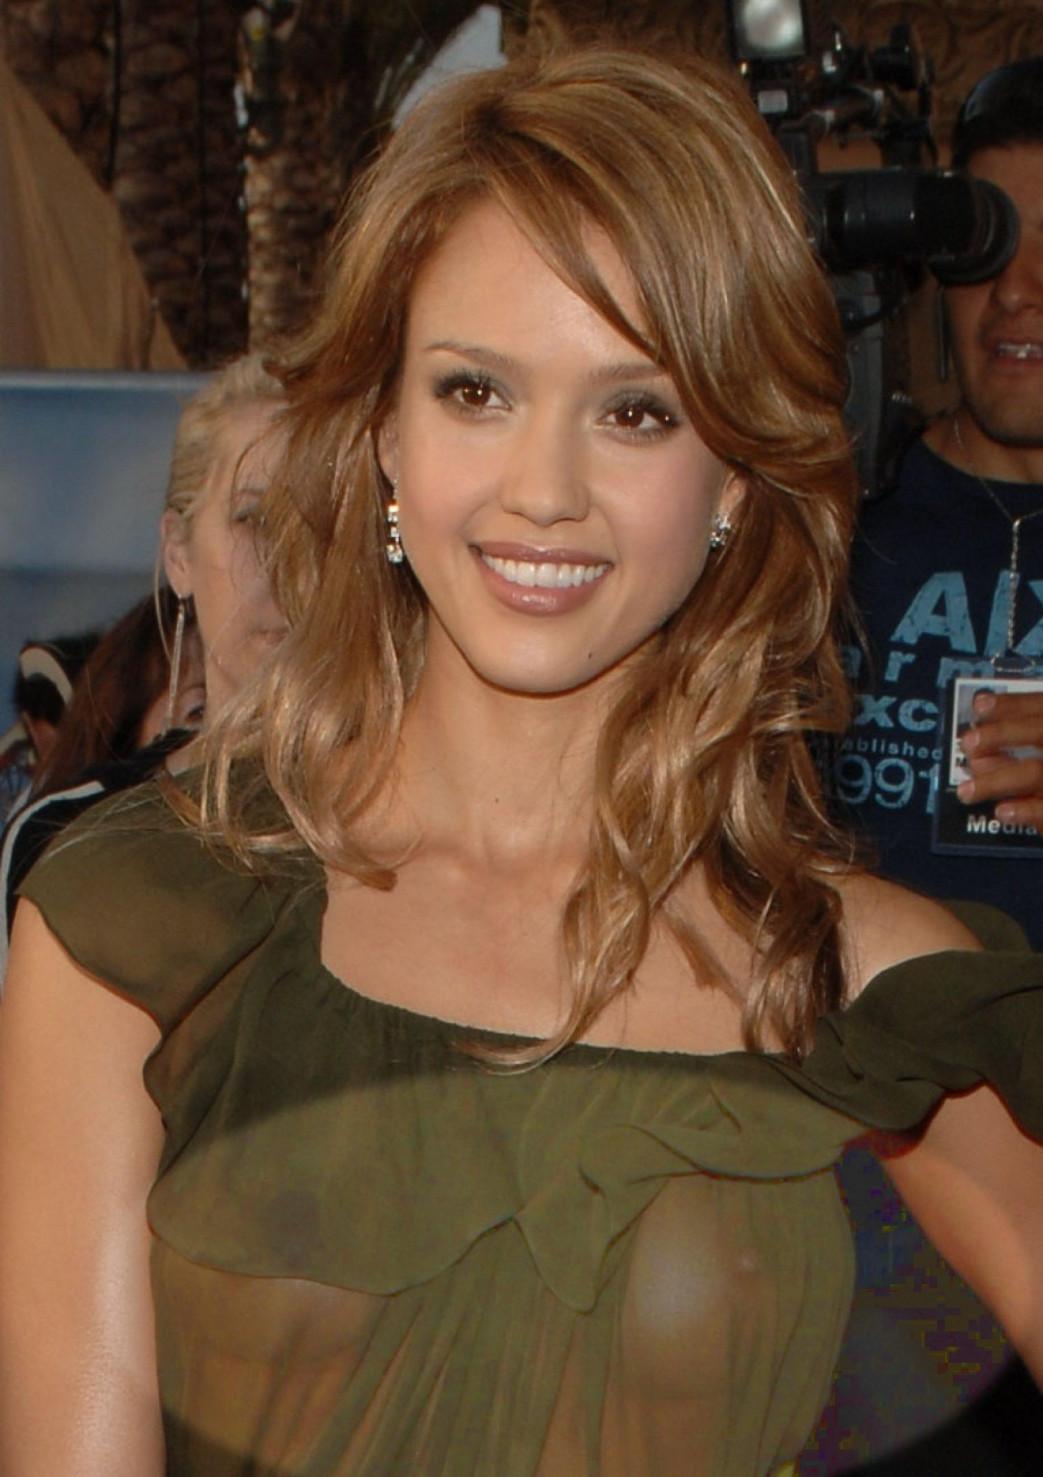 Jessica-Alba-Wardrobe-Malfuction-OOPS-Moments-26.jpg